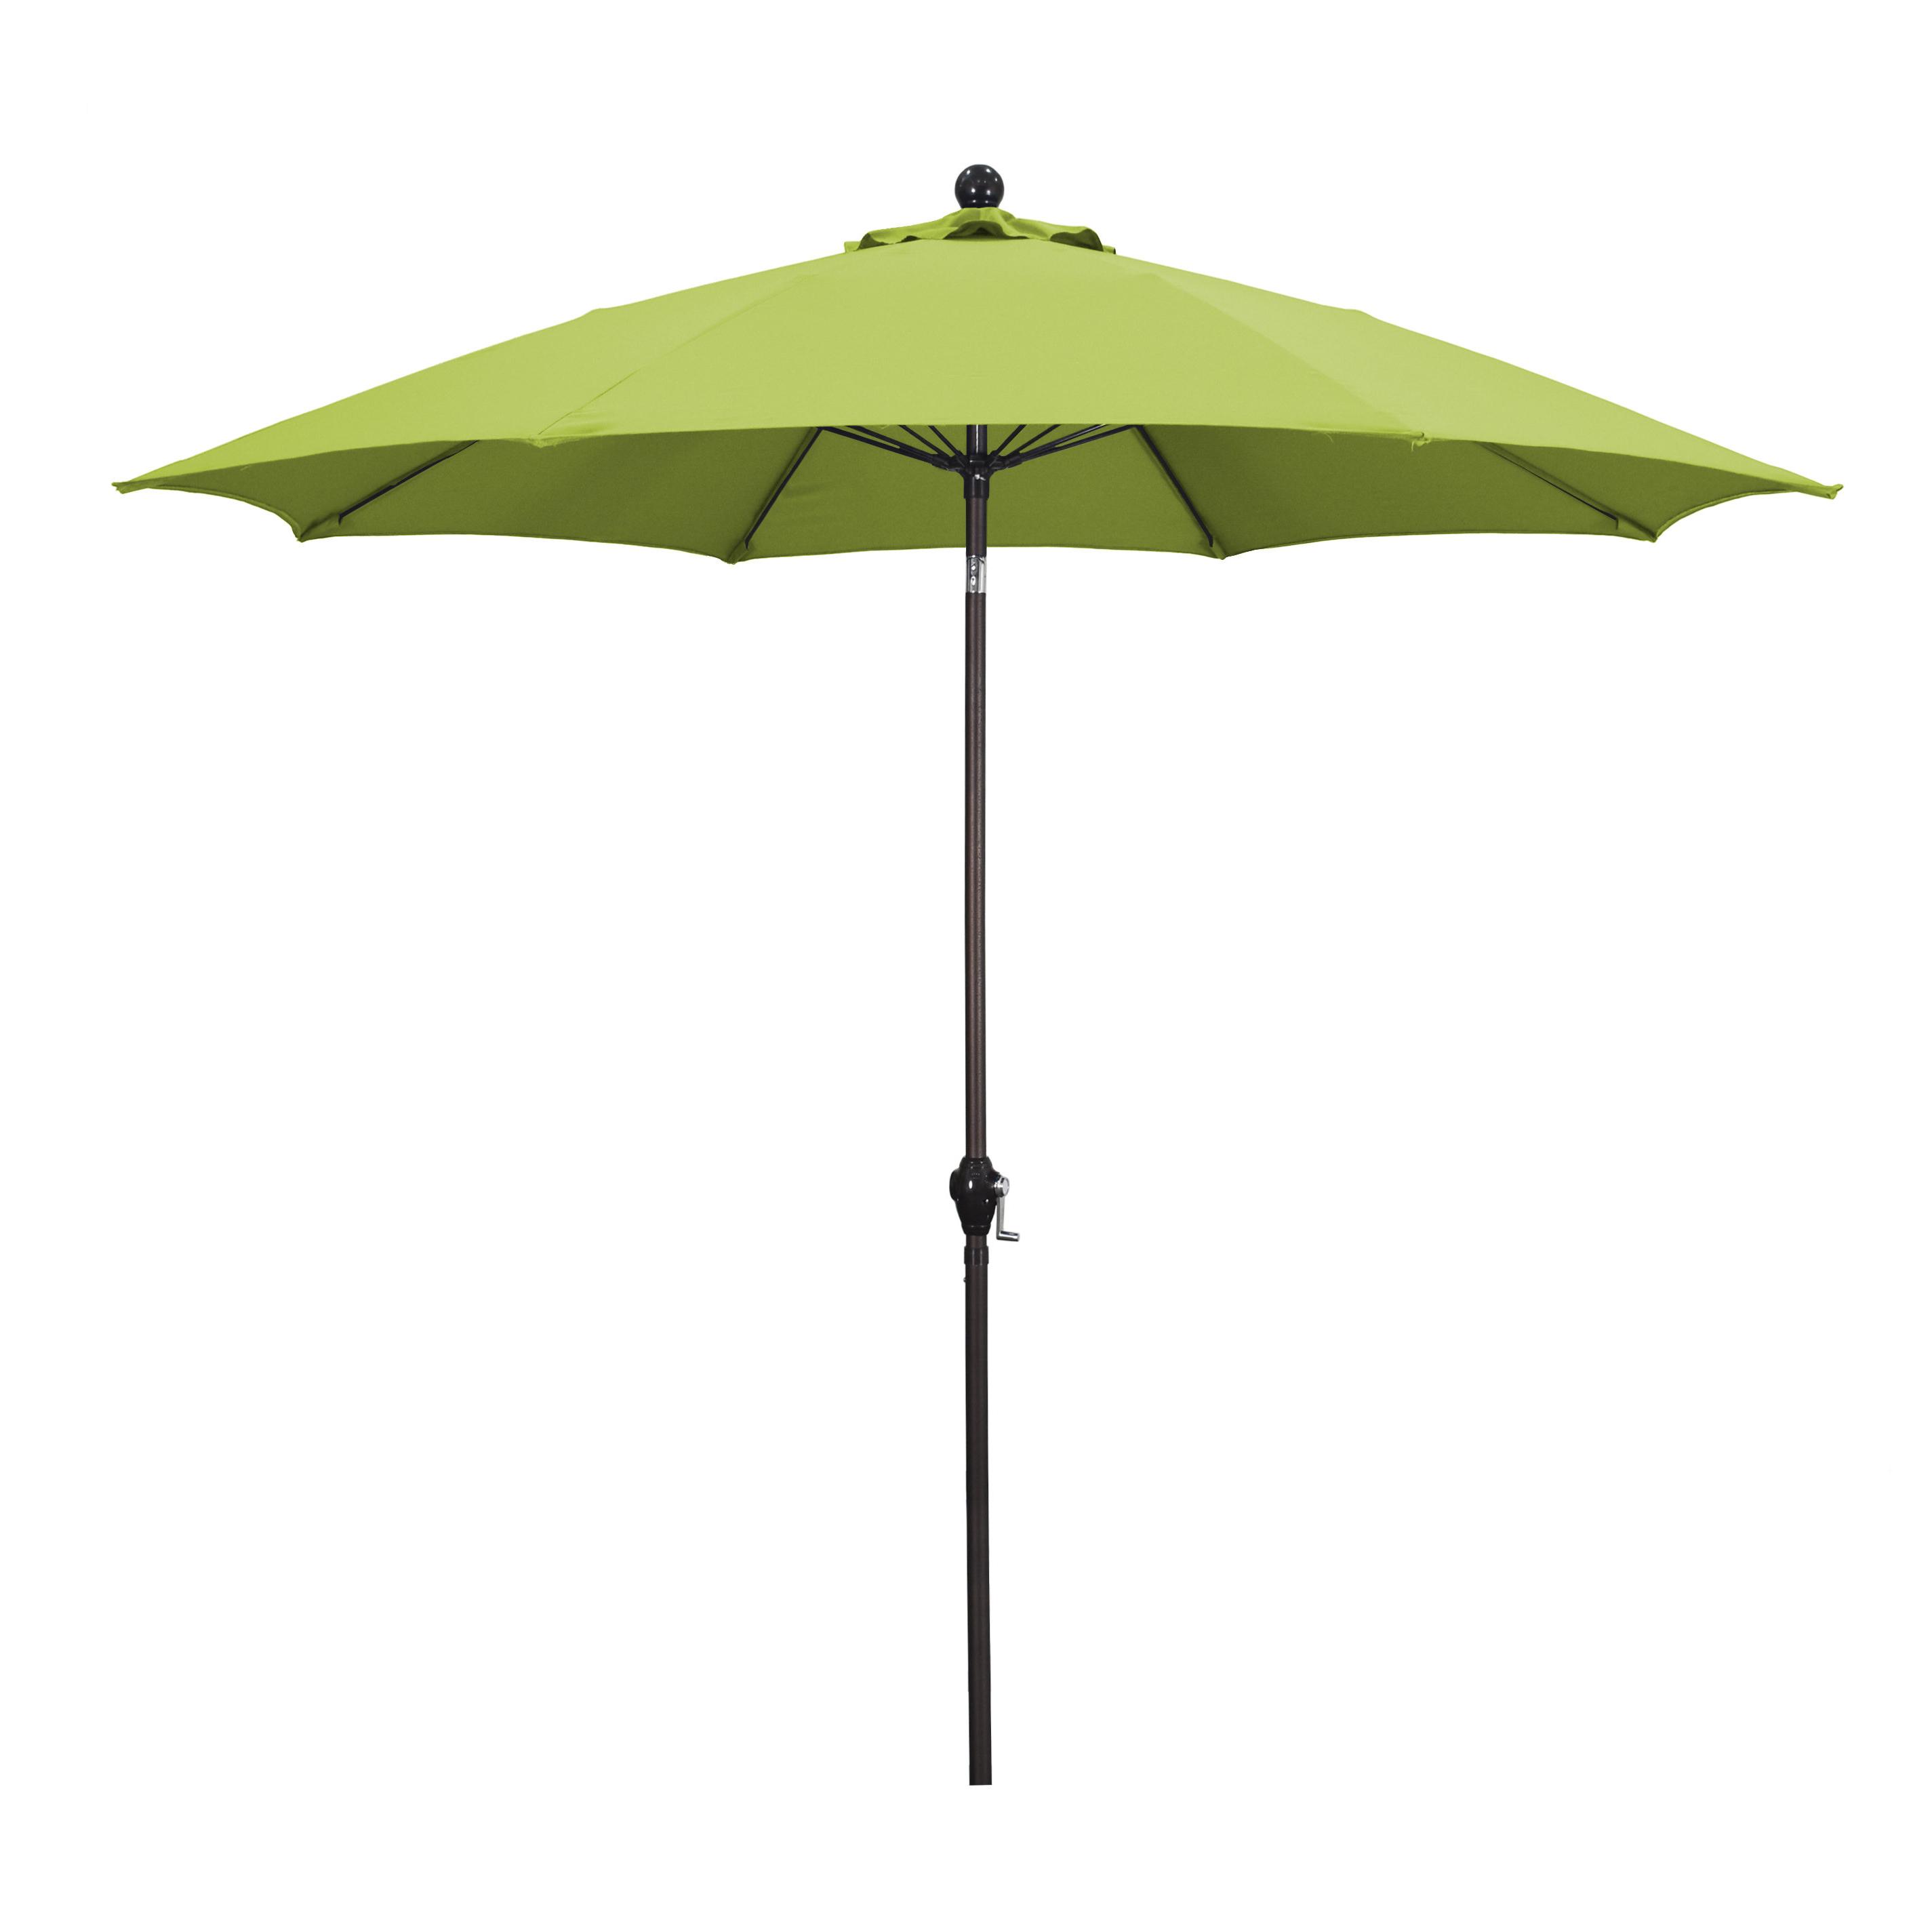 Newest 9' Market Umbrella With Regard To Carina Market Umbrellas (View 12 of 20)